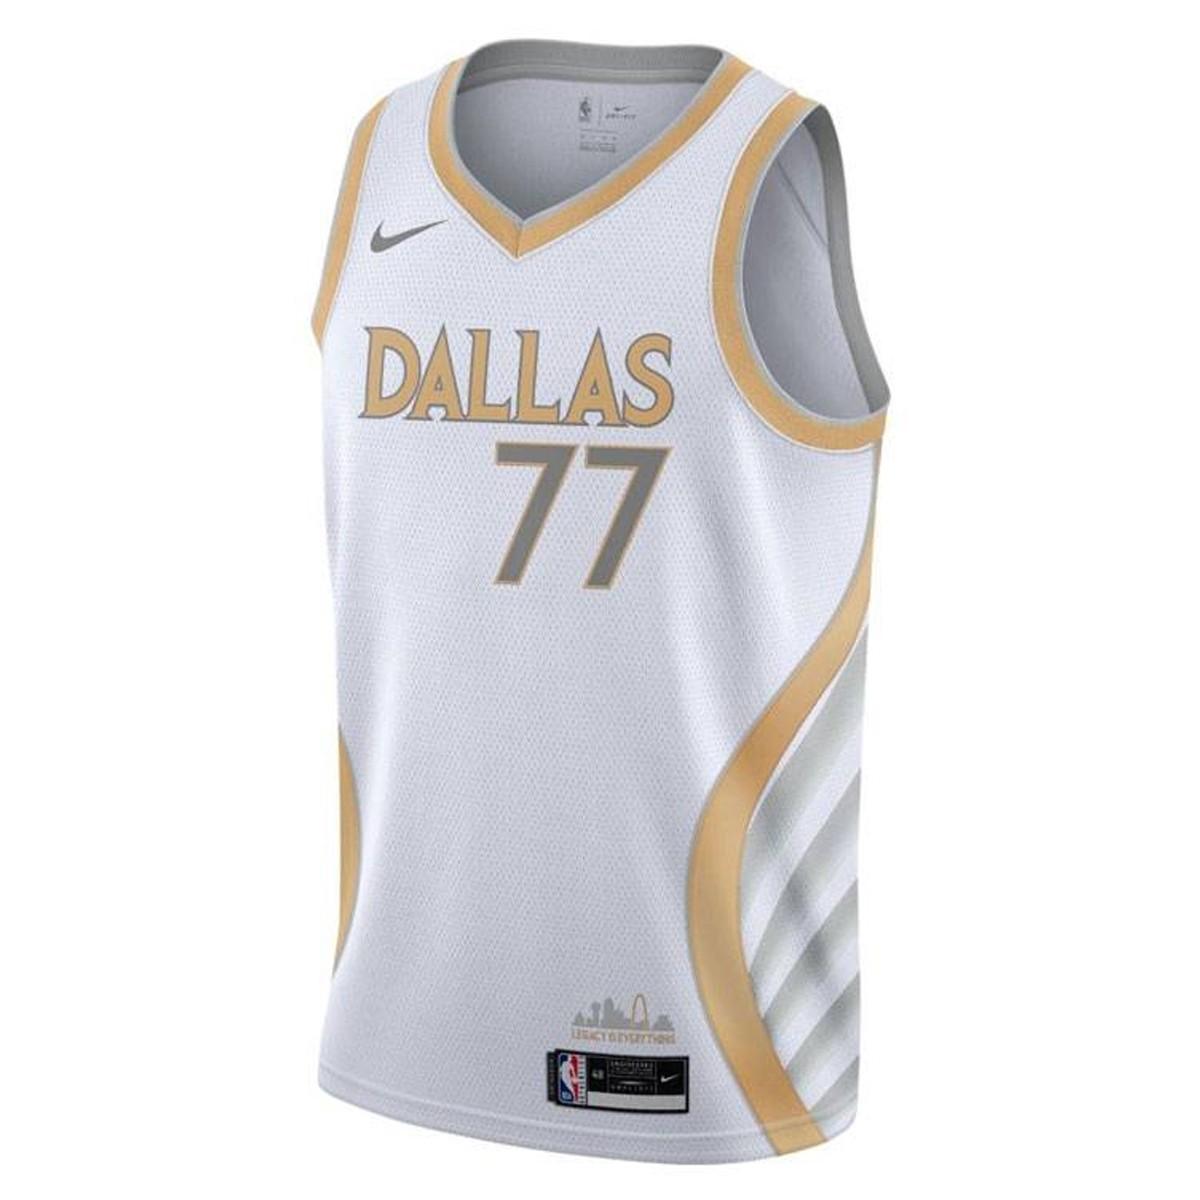 Nike Jr NBA Dallas Mavericks Swingman Jersey Luka Doncic 'City Edition'